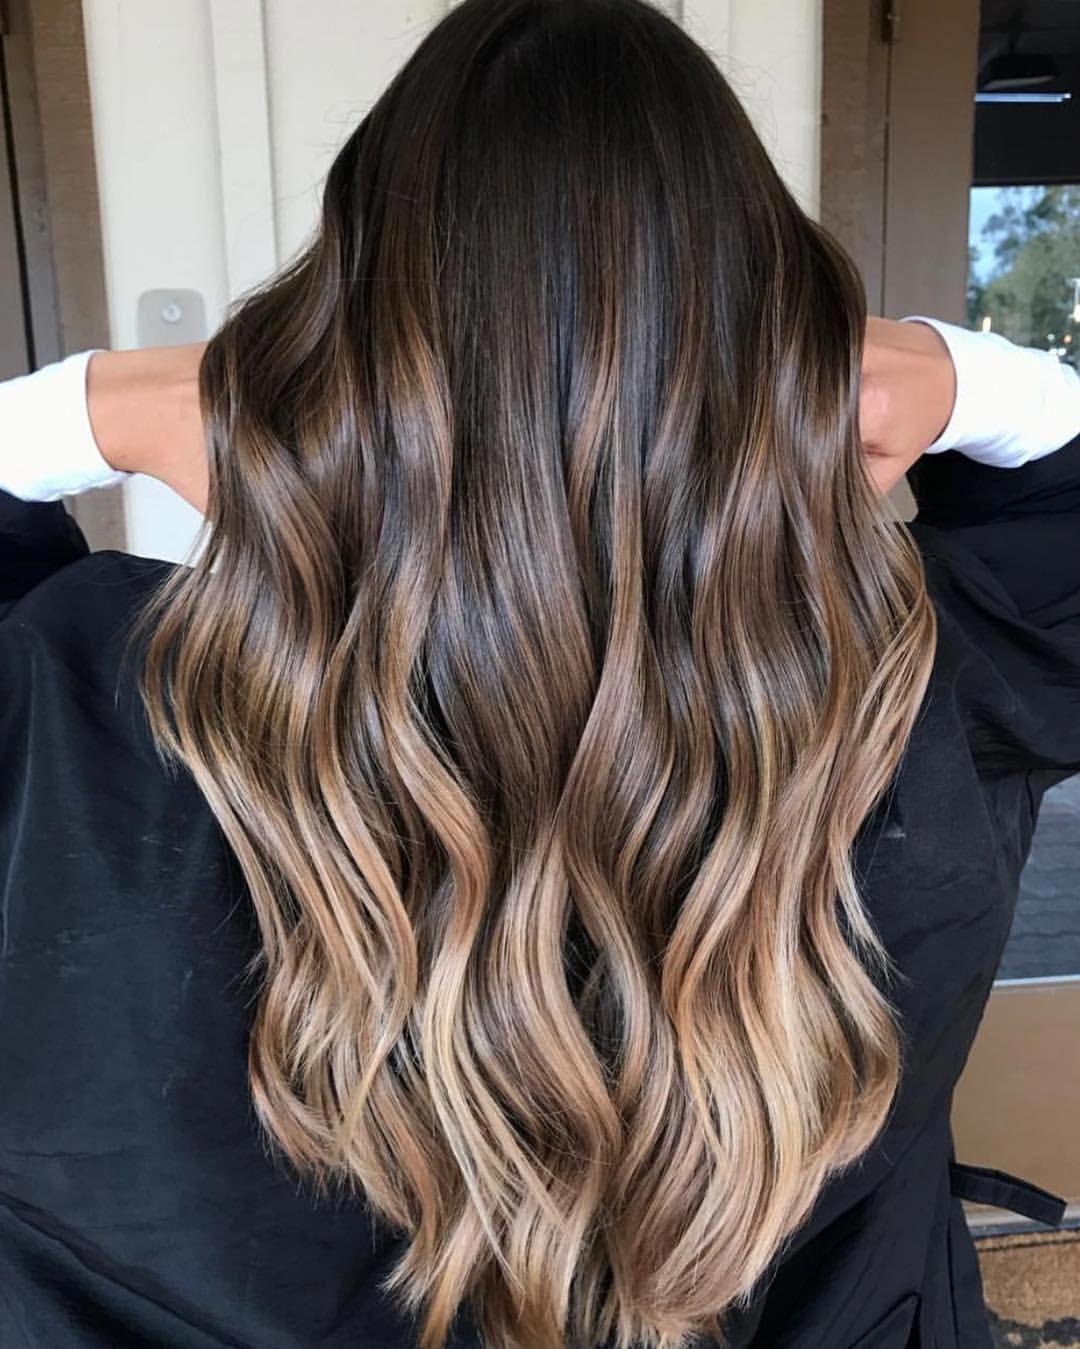 A Personal Favorite of 2017! By @hair_by_bailey_ #bestofbalayage #showmethebalayage #brunettehair